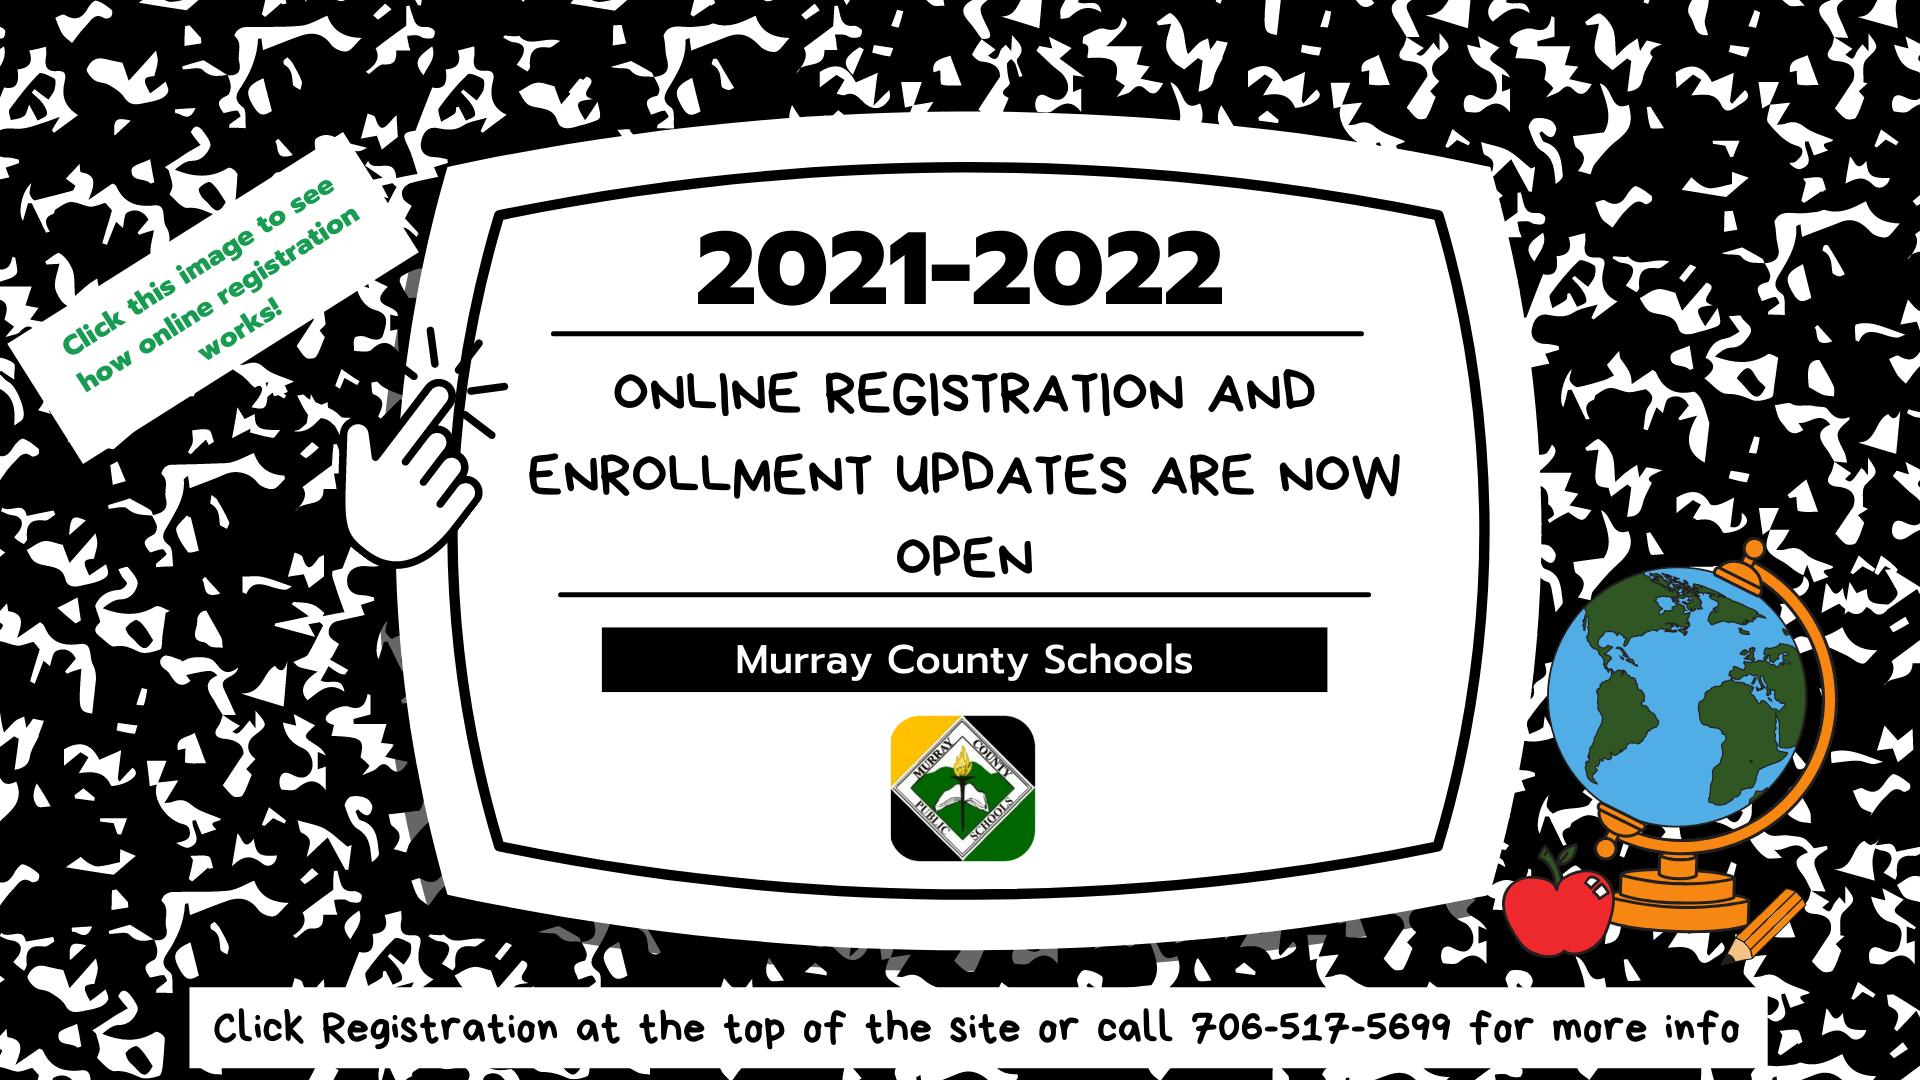 Registration now open